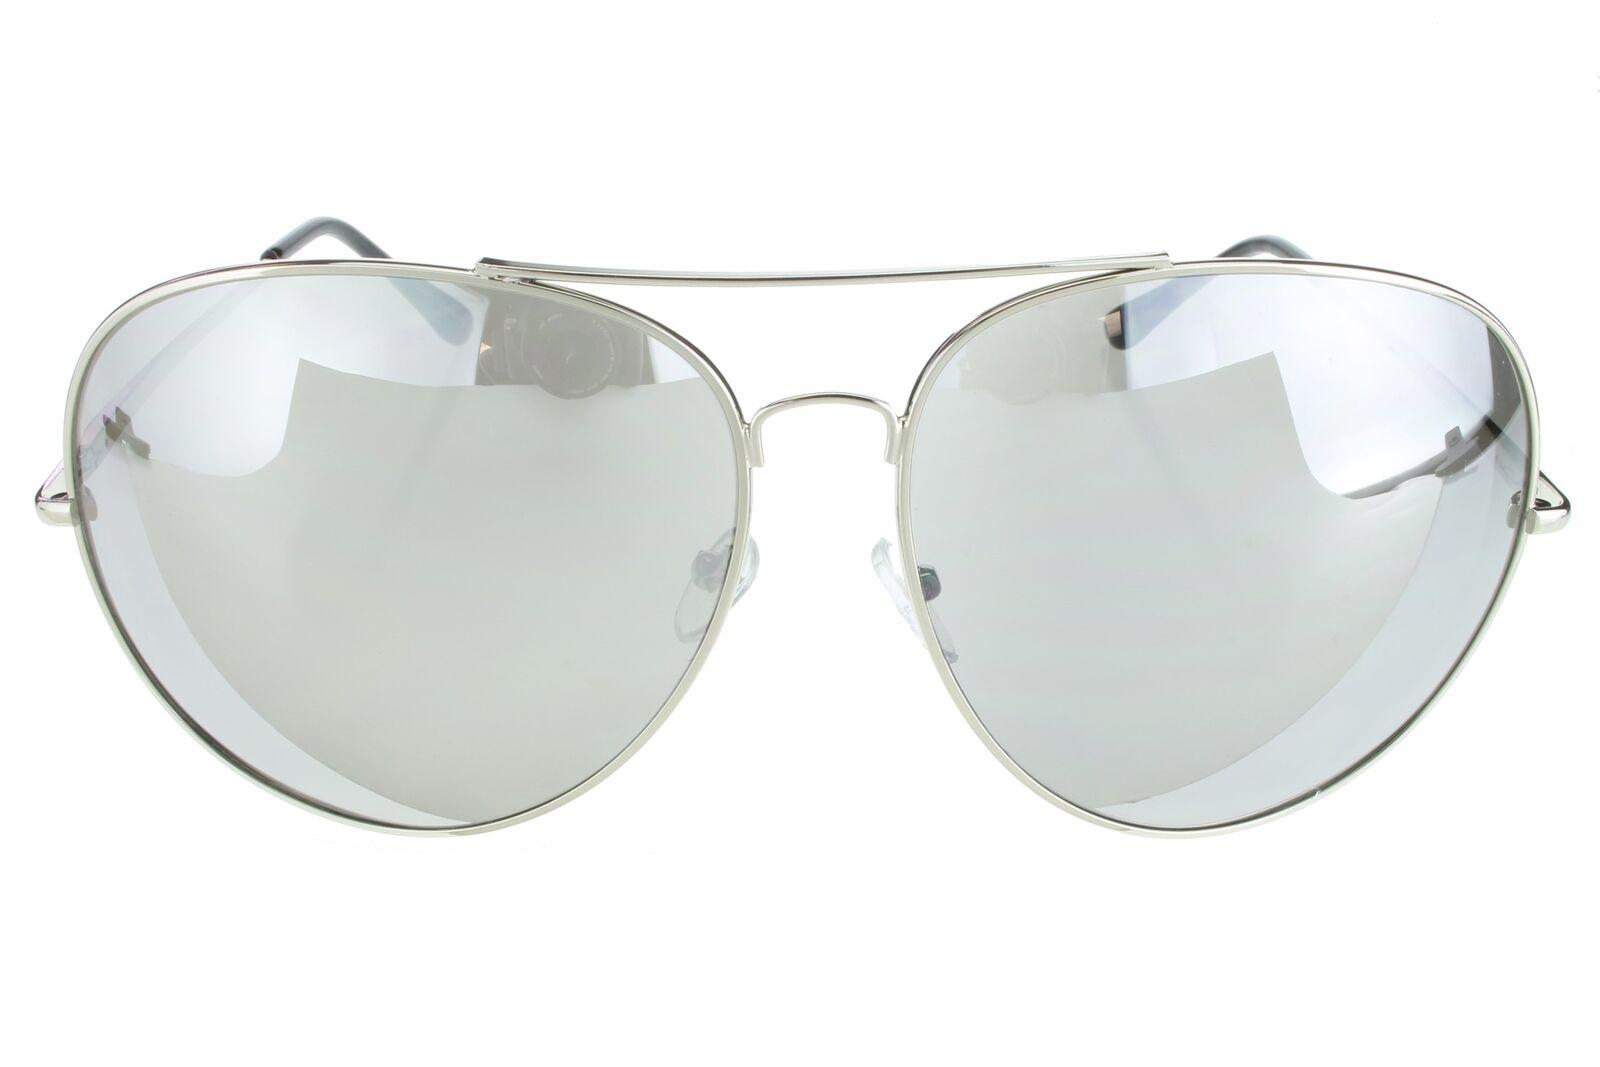 3 PAIR Oversize Extra Large PILOT Sunglasses Silver Frame Mirror Lenses XXL r